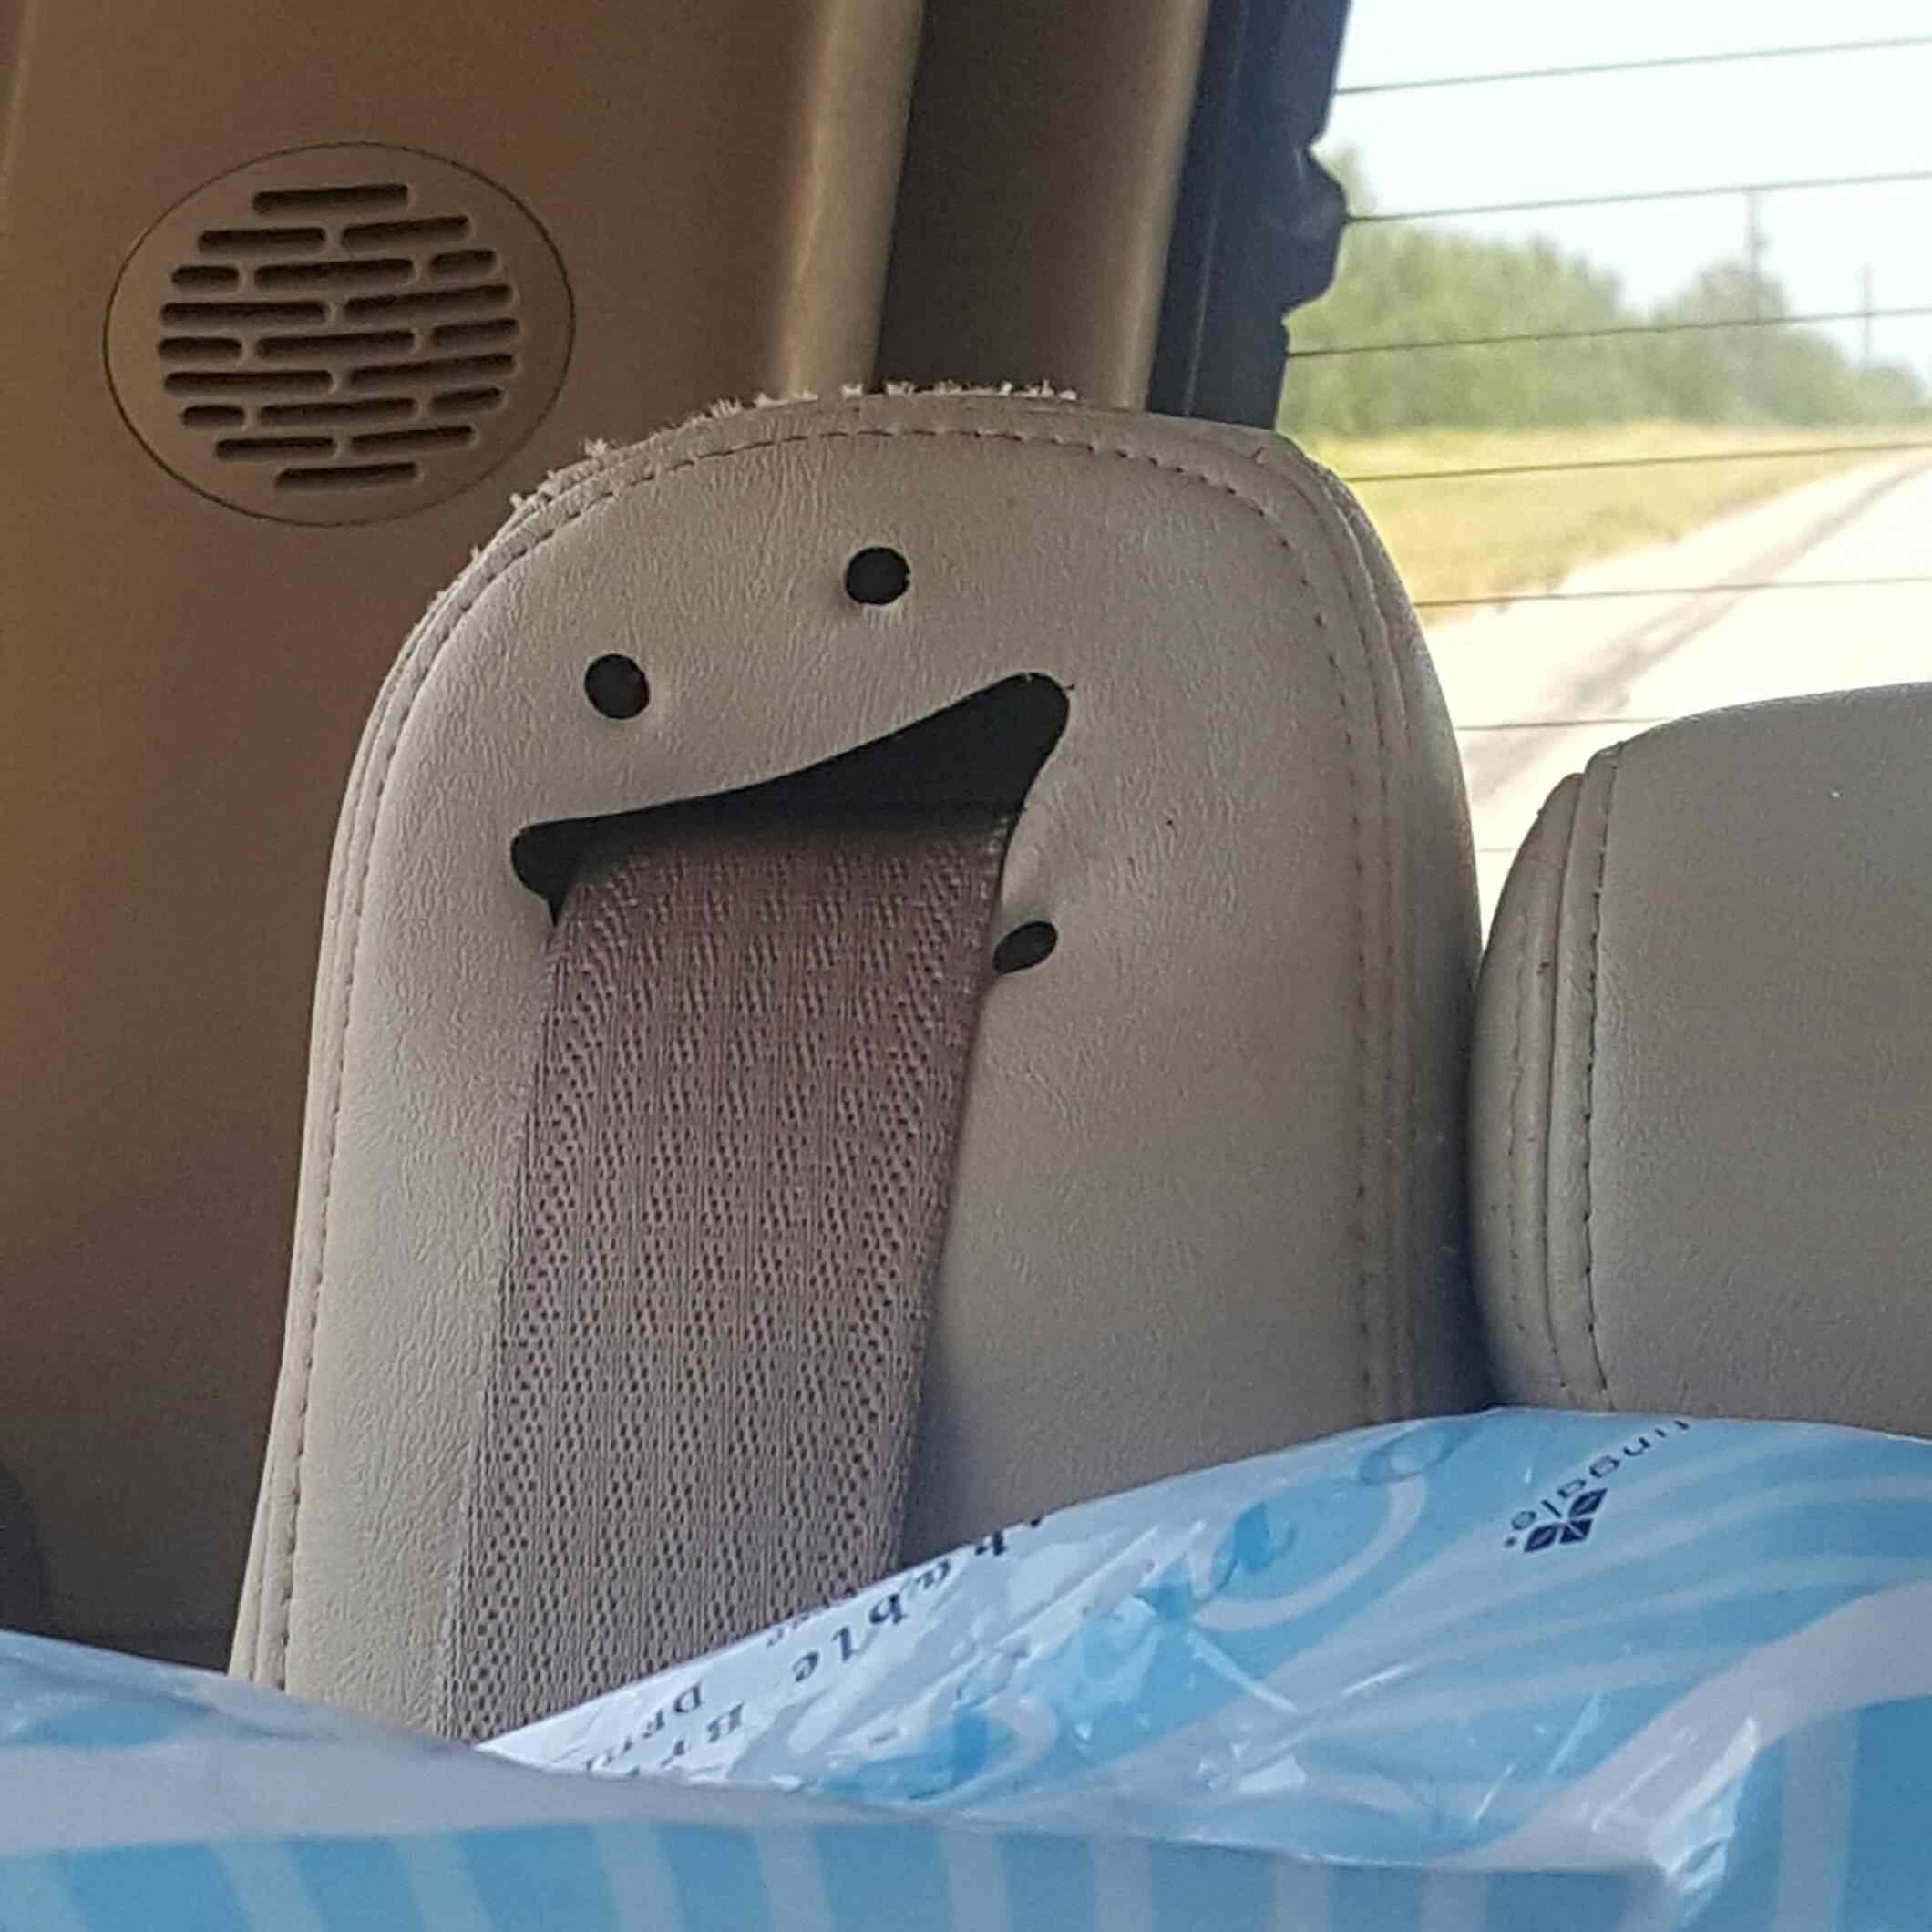 seatbelt that looks like a face